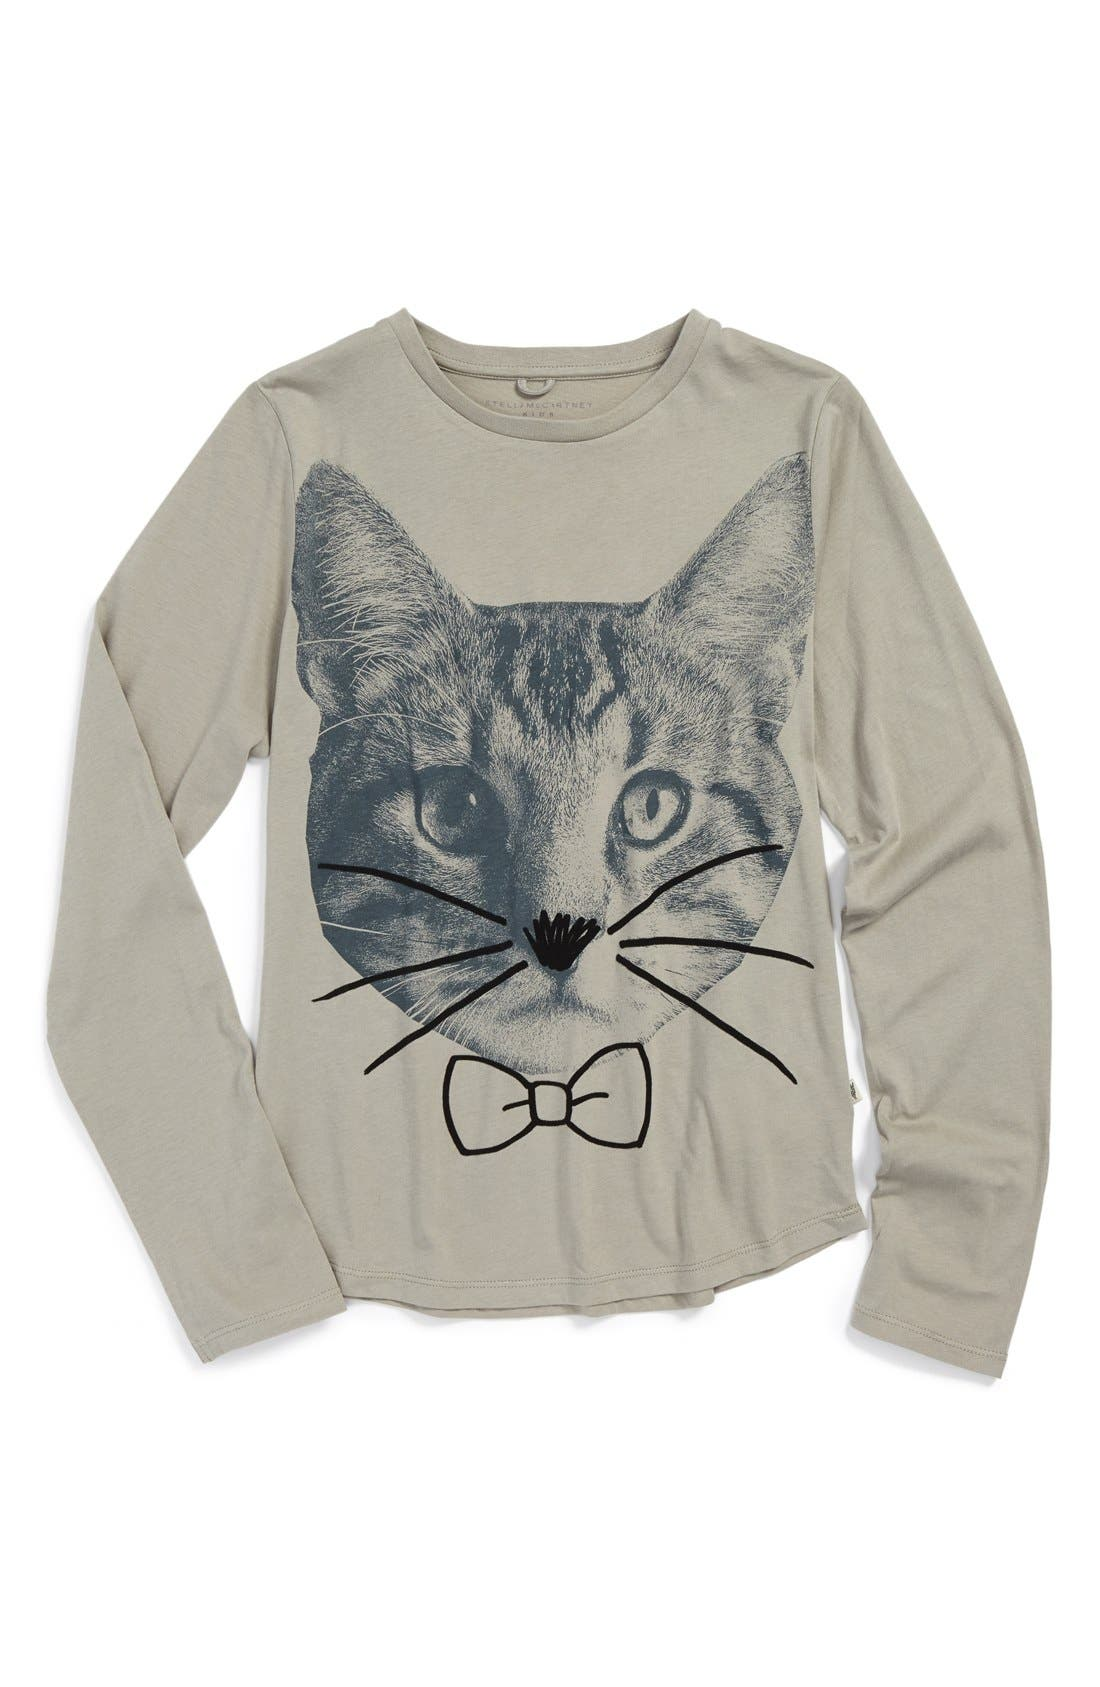 Main Image - Stella McCartney Kids 'Cat' Long Sleeve Tee (Toddler Girls, Little Girls & Big Girls)